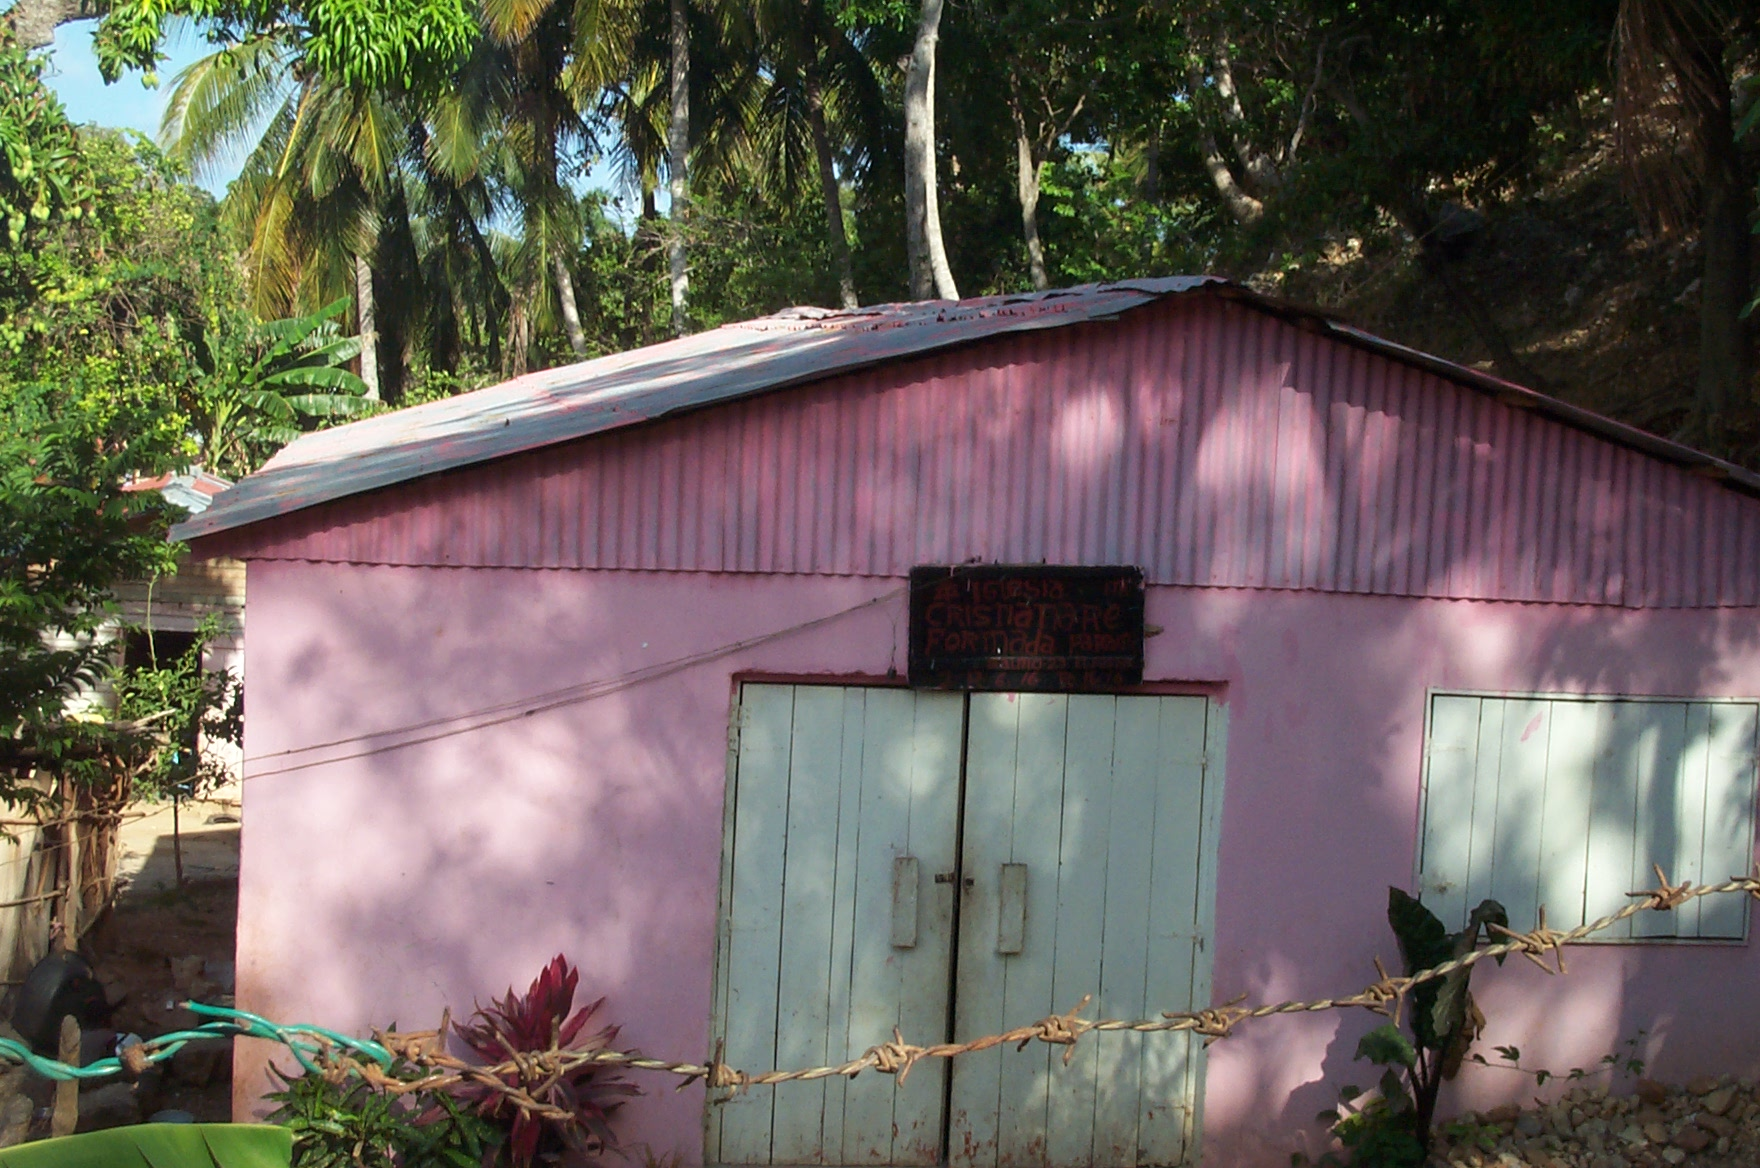 Iglesia Cristiana Reformada Paraíso, Barahona, República Dominica.